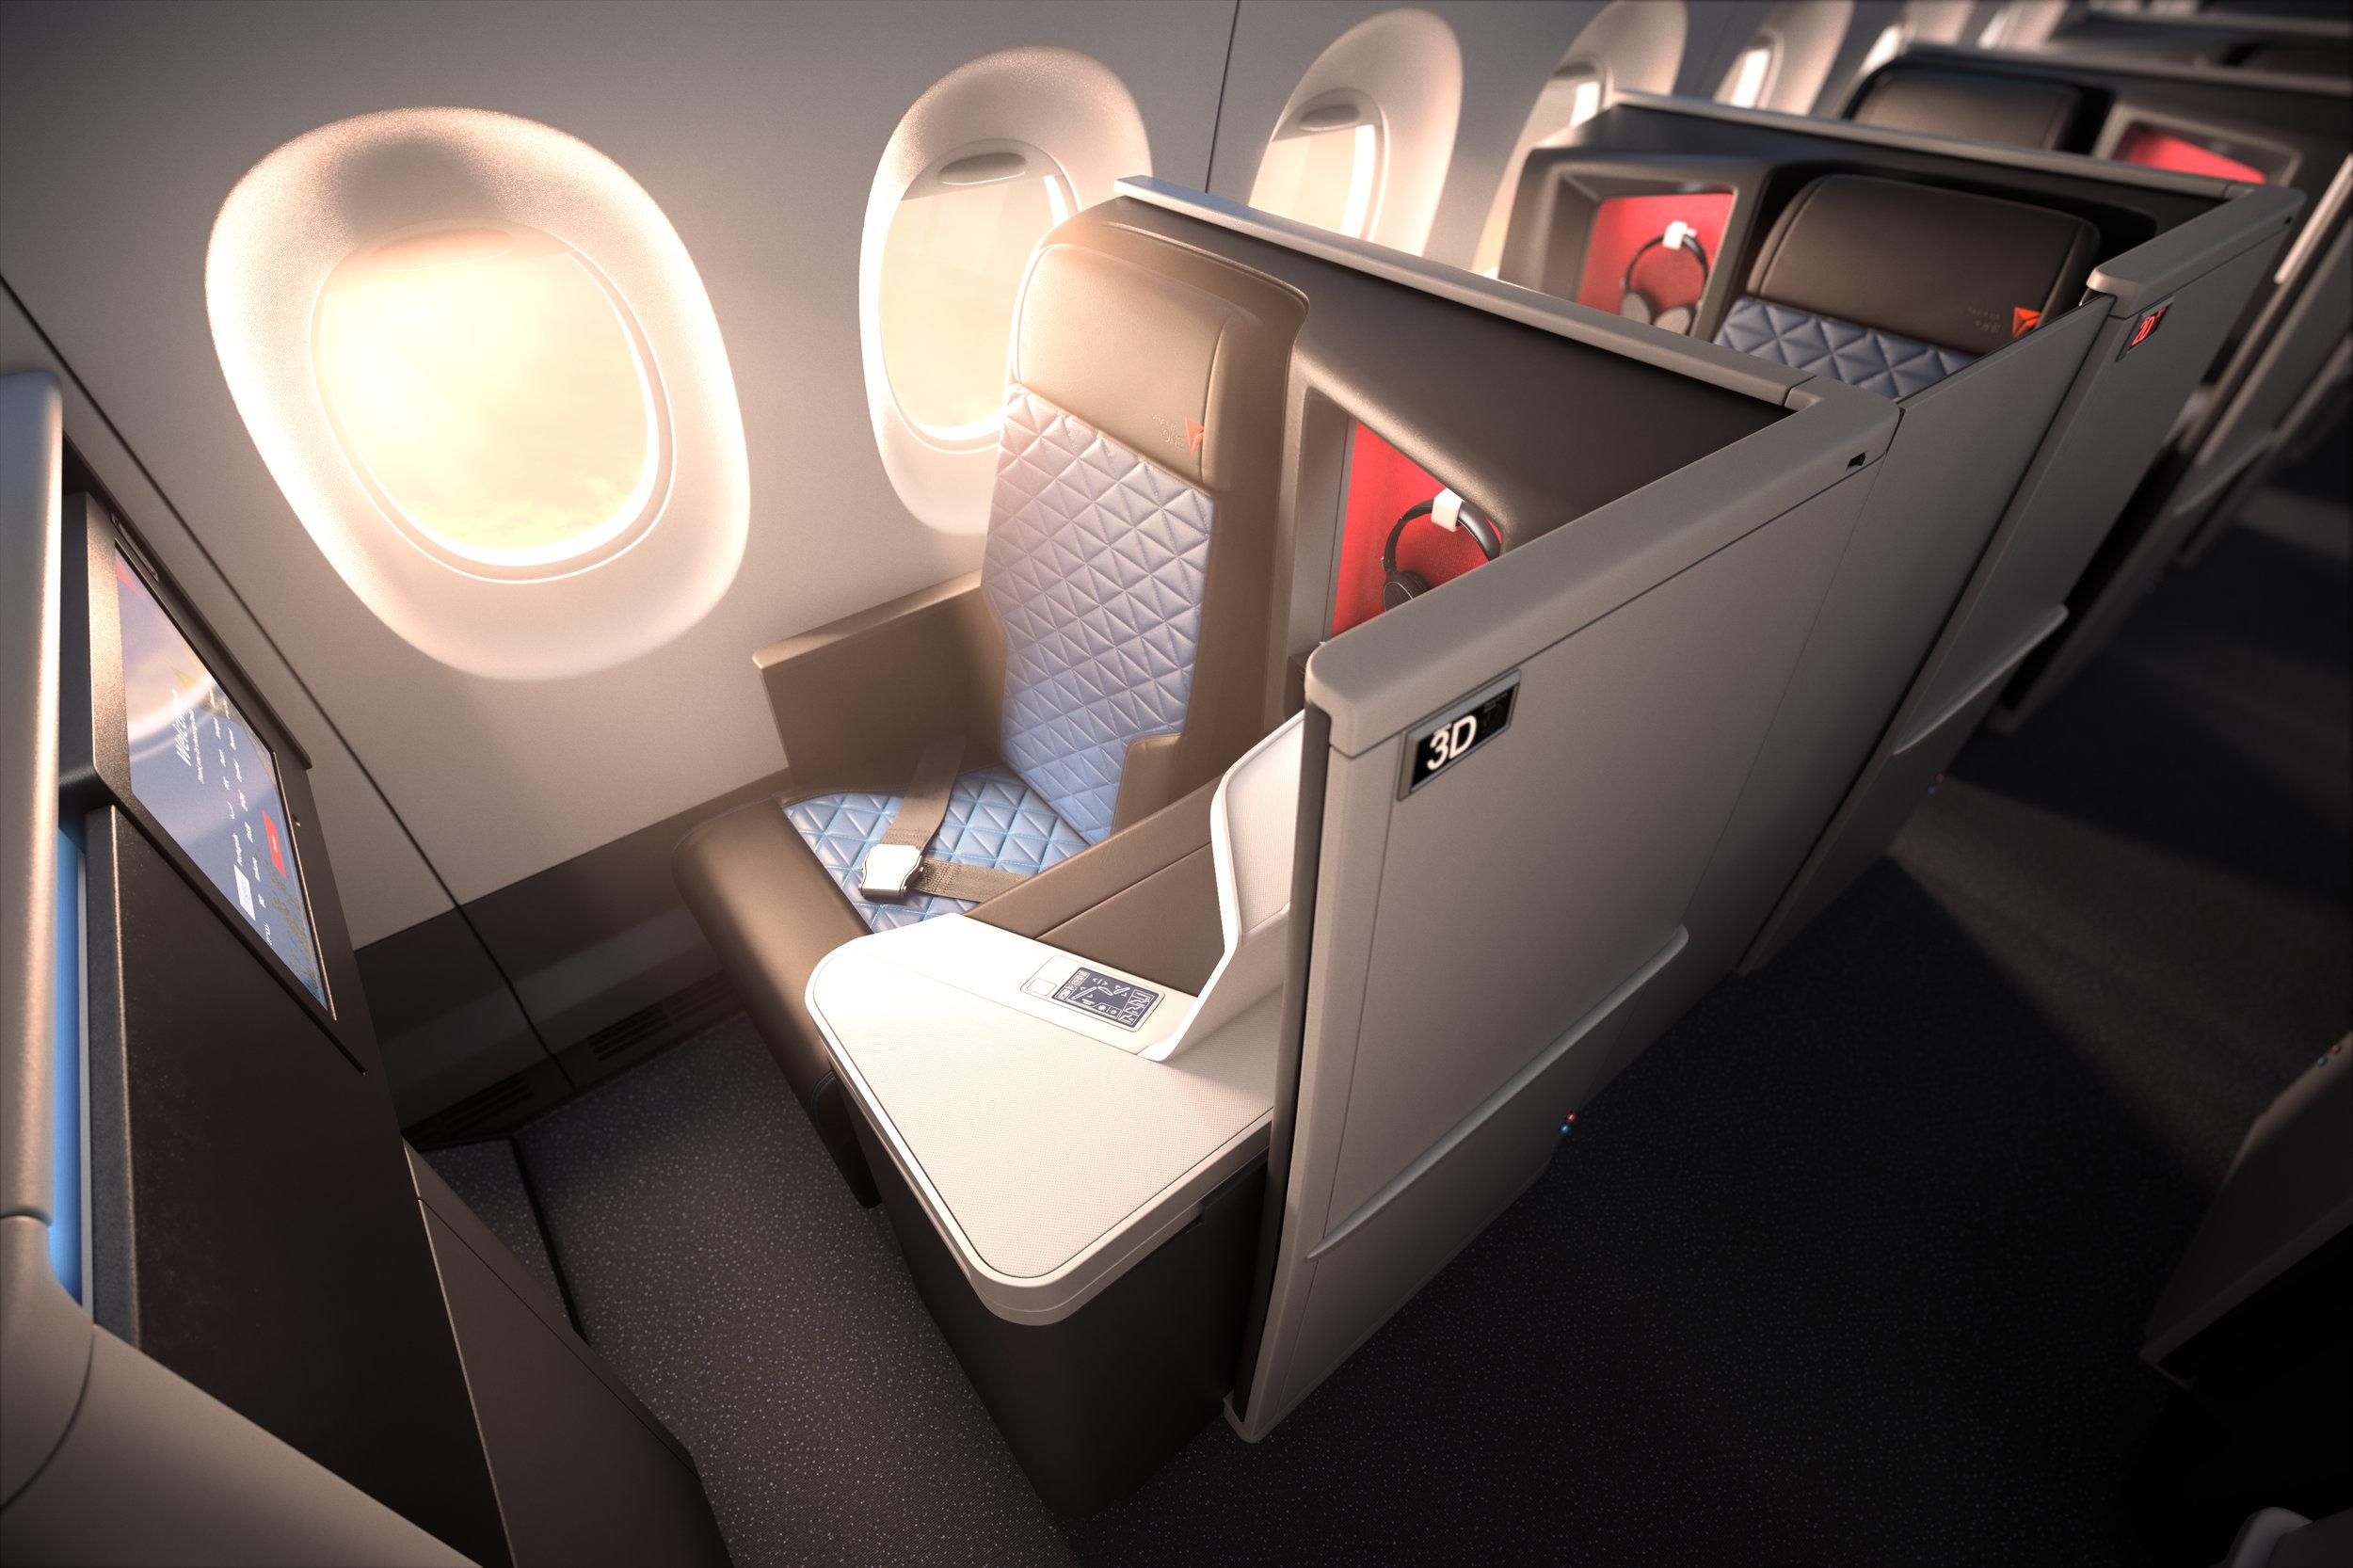 Pîcture: Delta Airlines